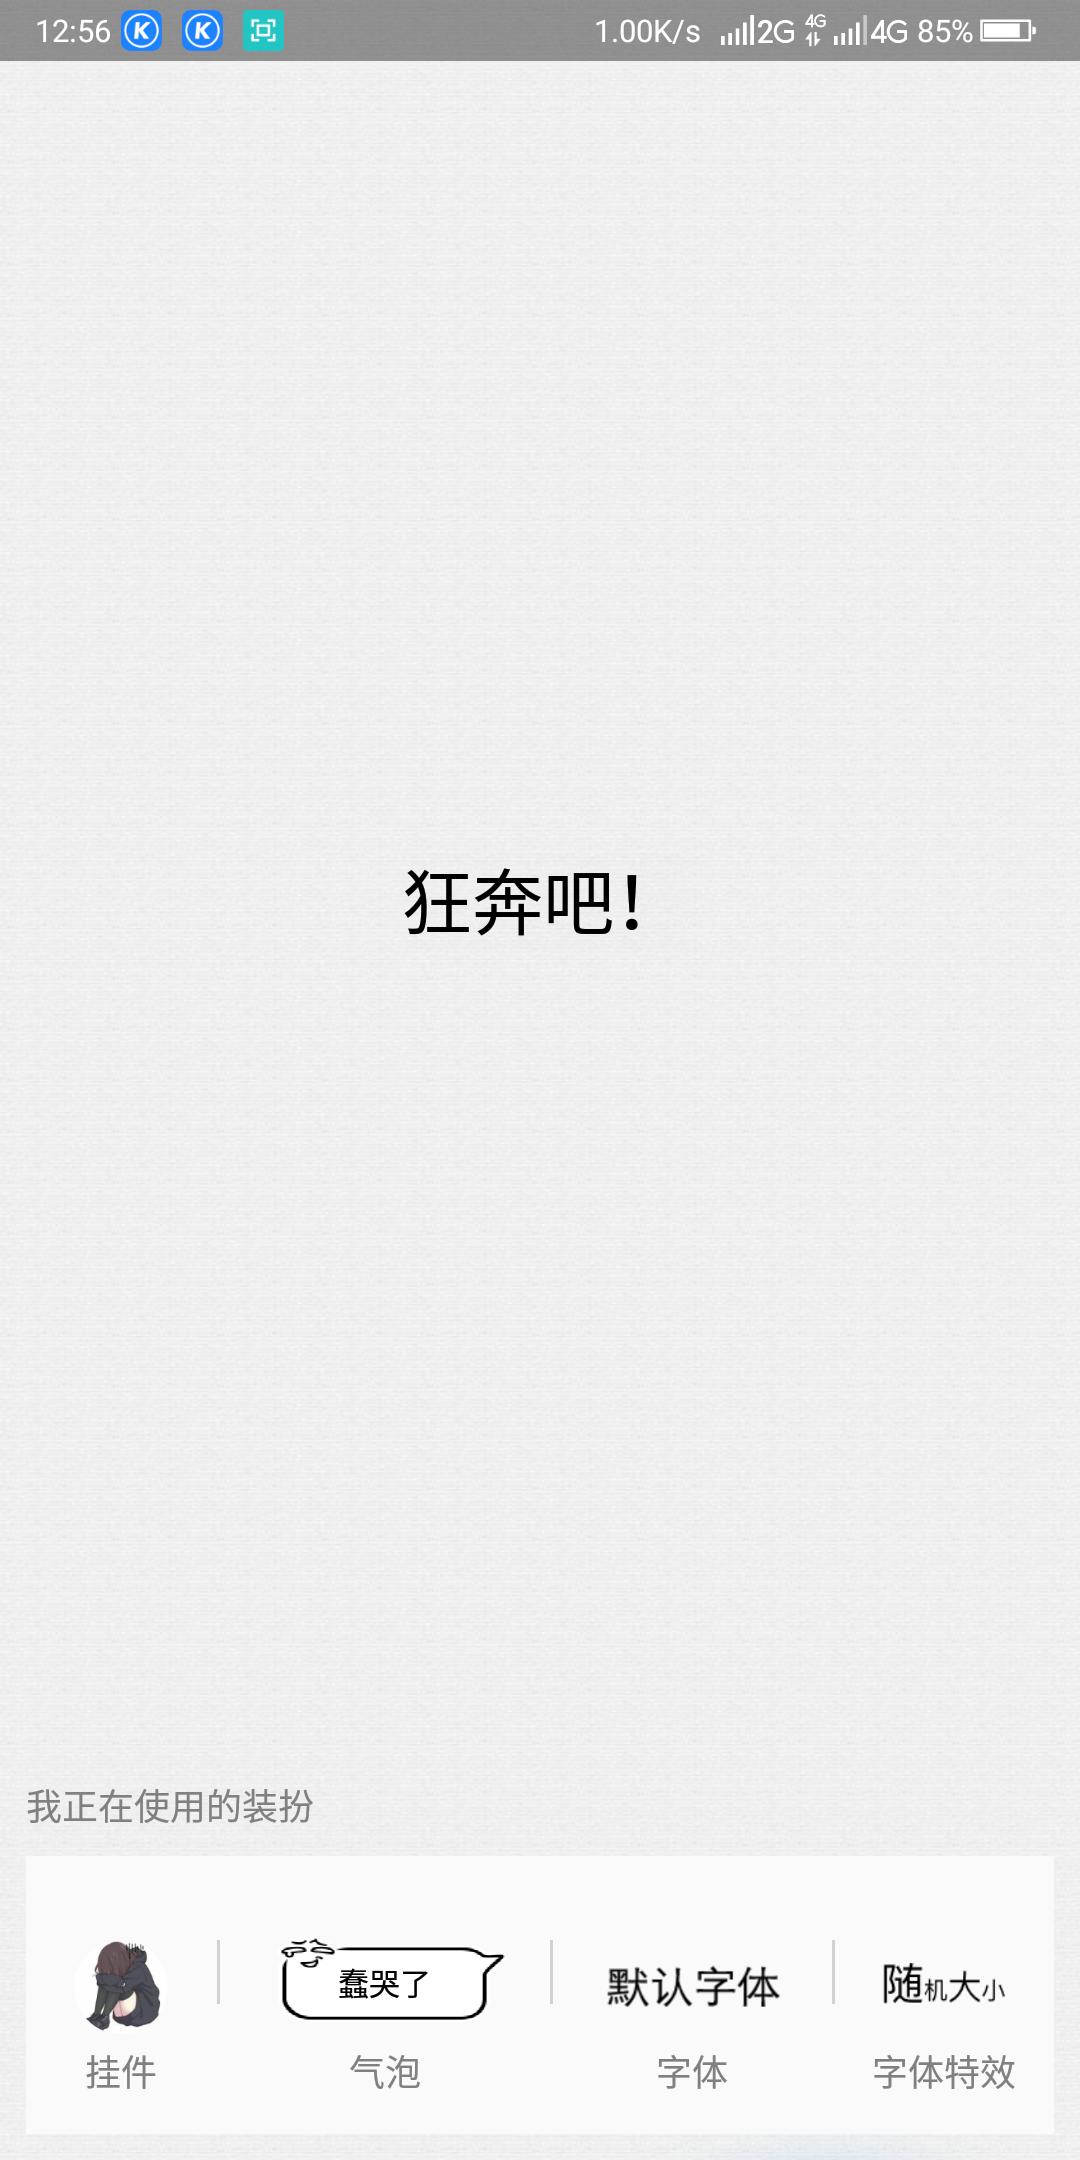 Screenshot_2018-06-19-12-56-51.png